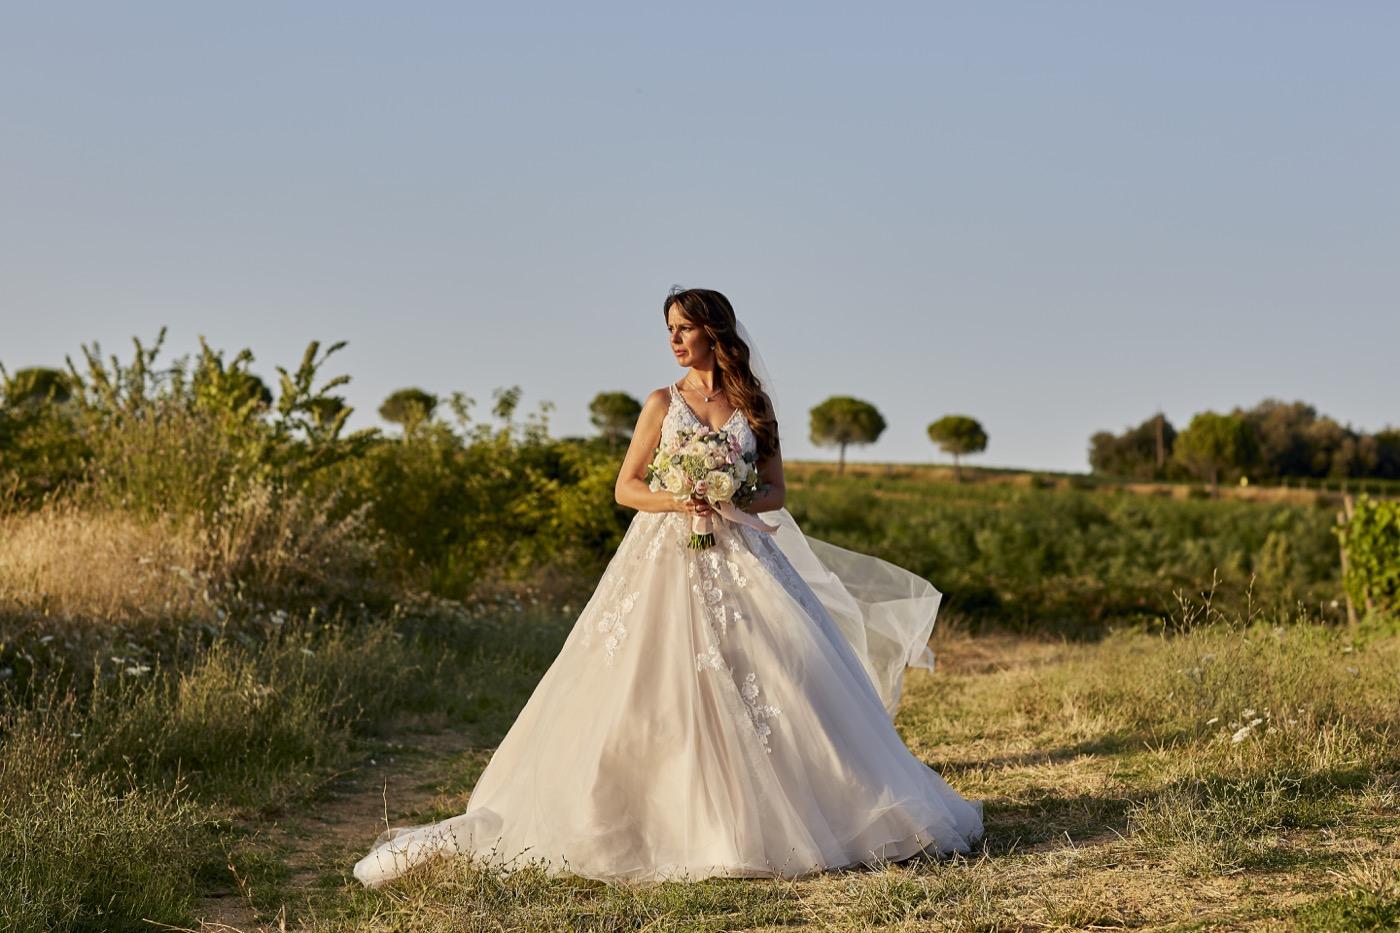 Claudio-Coppola-wedding-photographer-la-scuderia-eventi-preparativi-la-rosetta-perugia-67